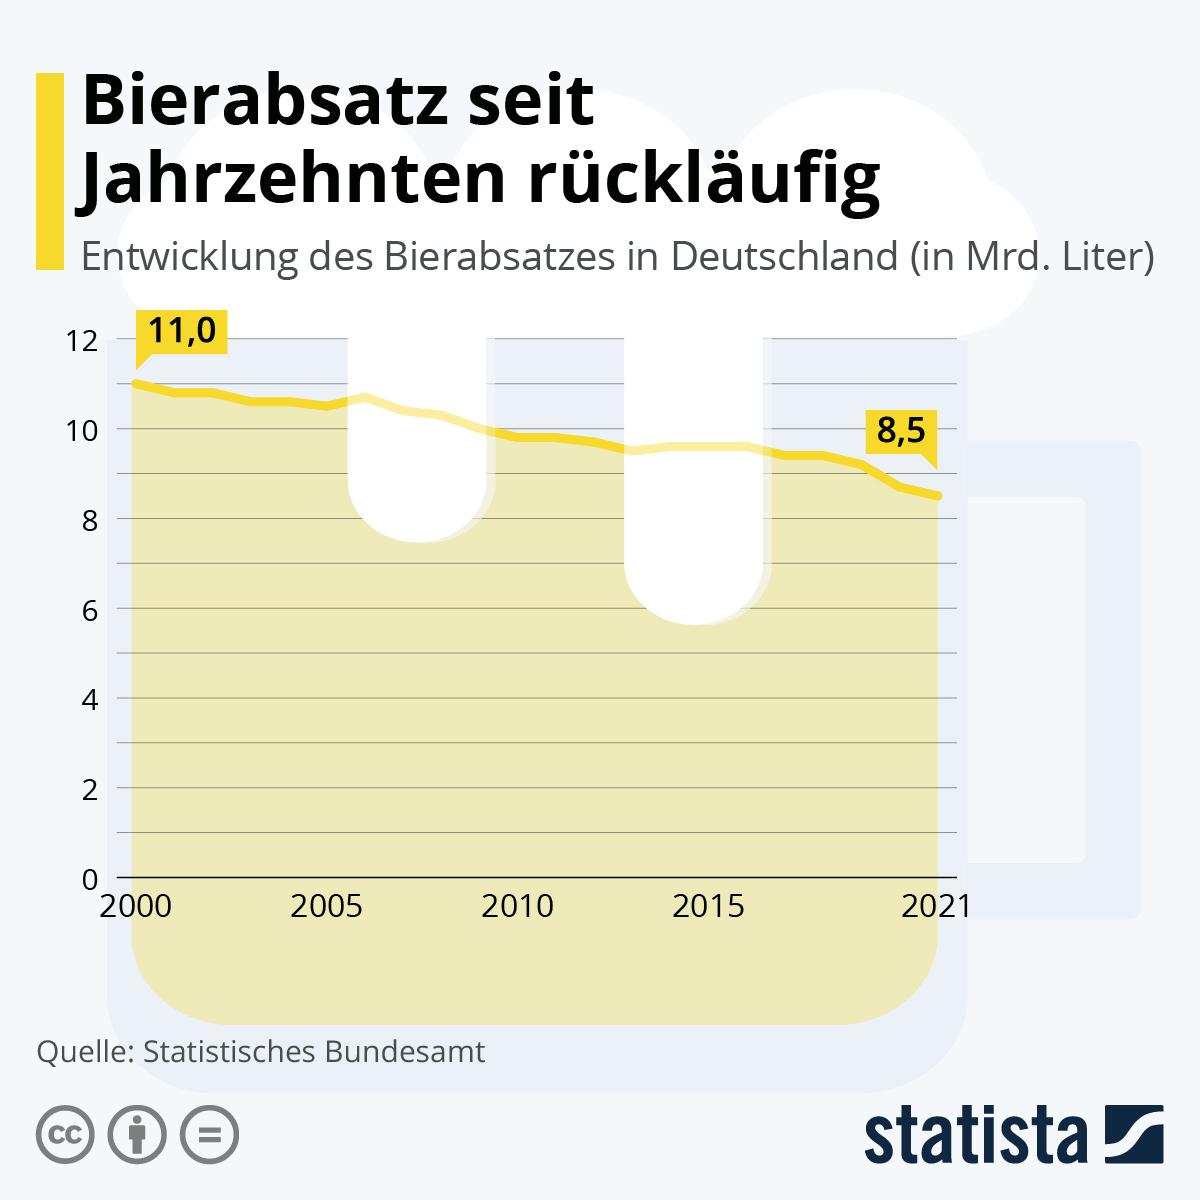 Infografik: Bierabsatz 2017 rückläufig | Statista